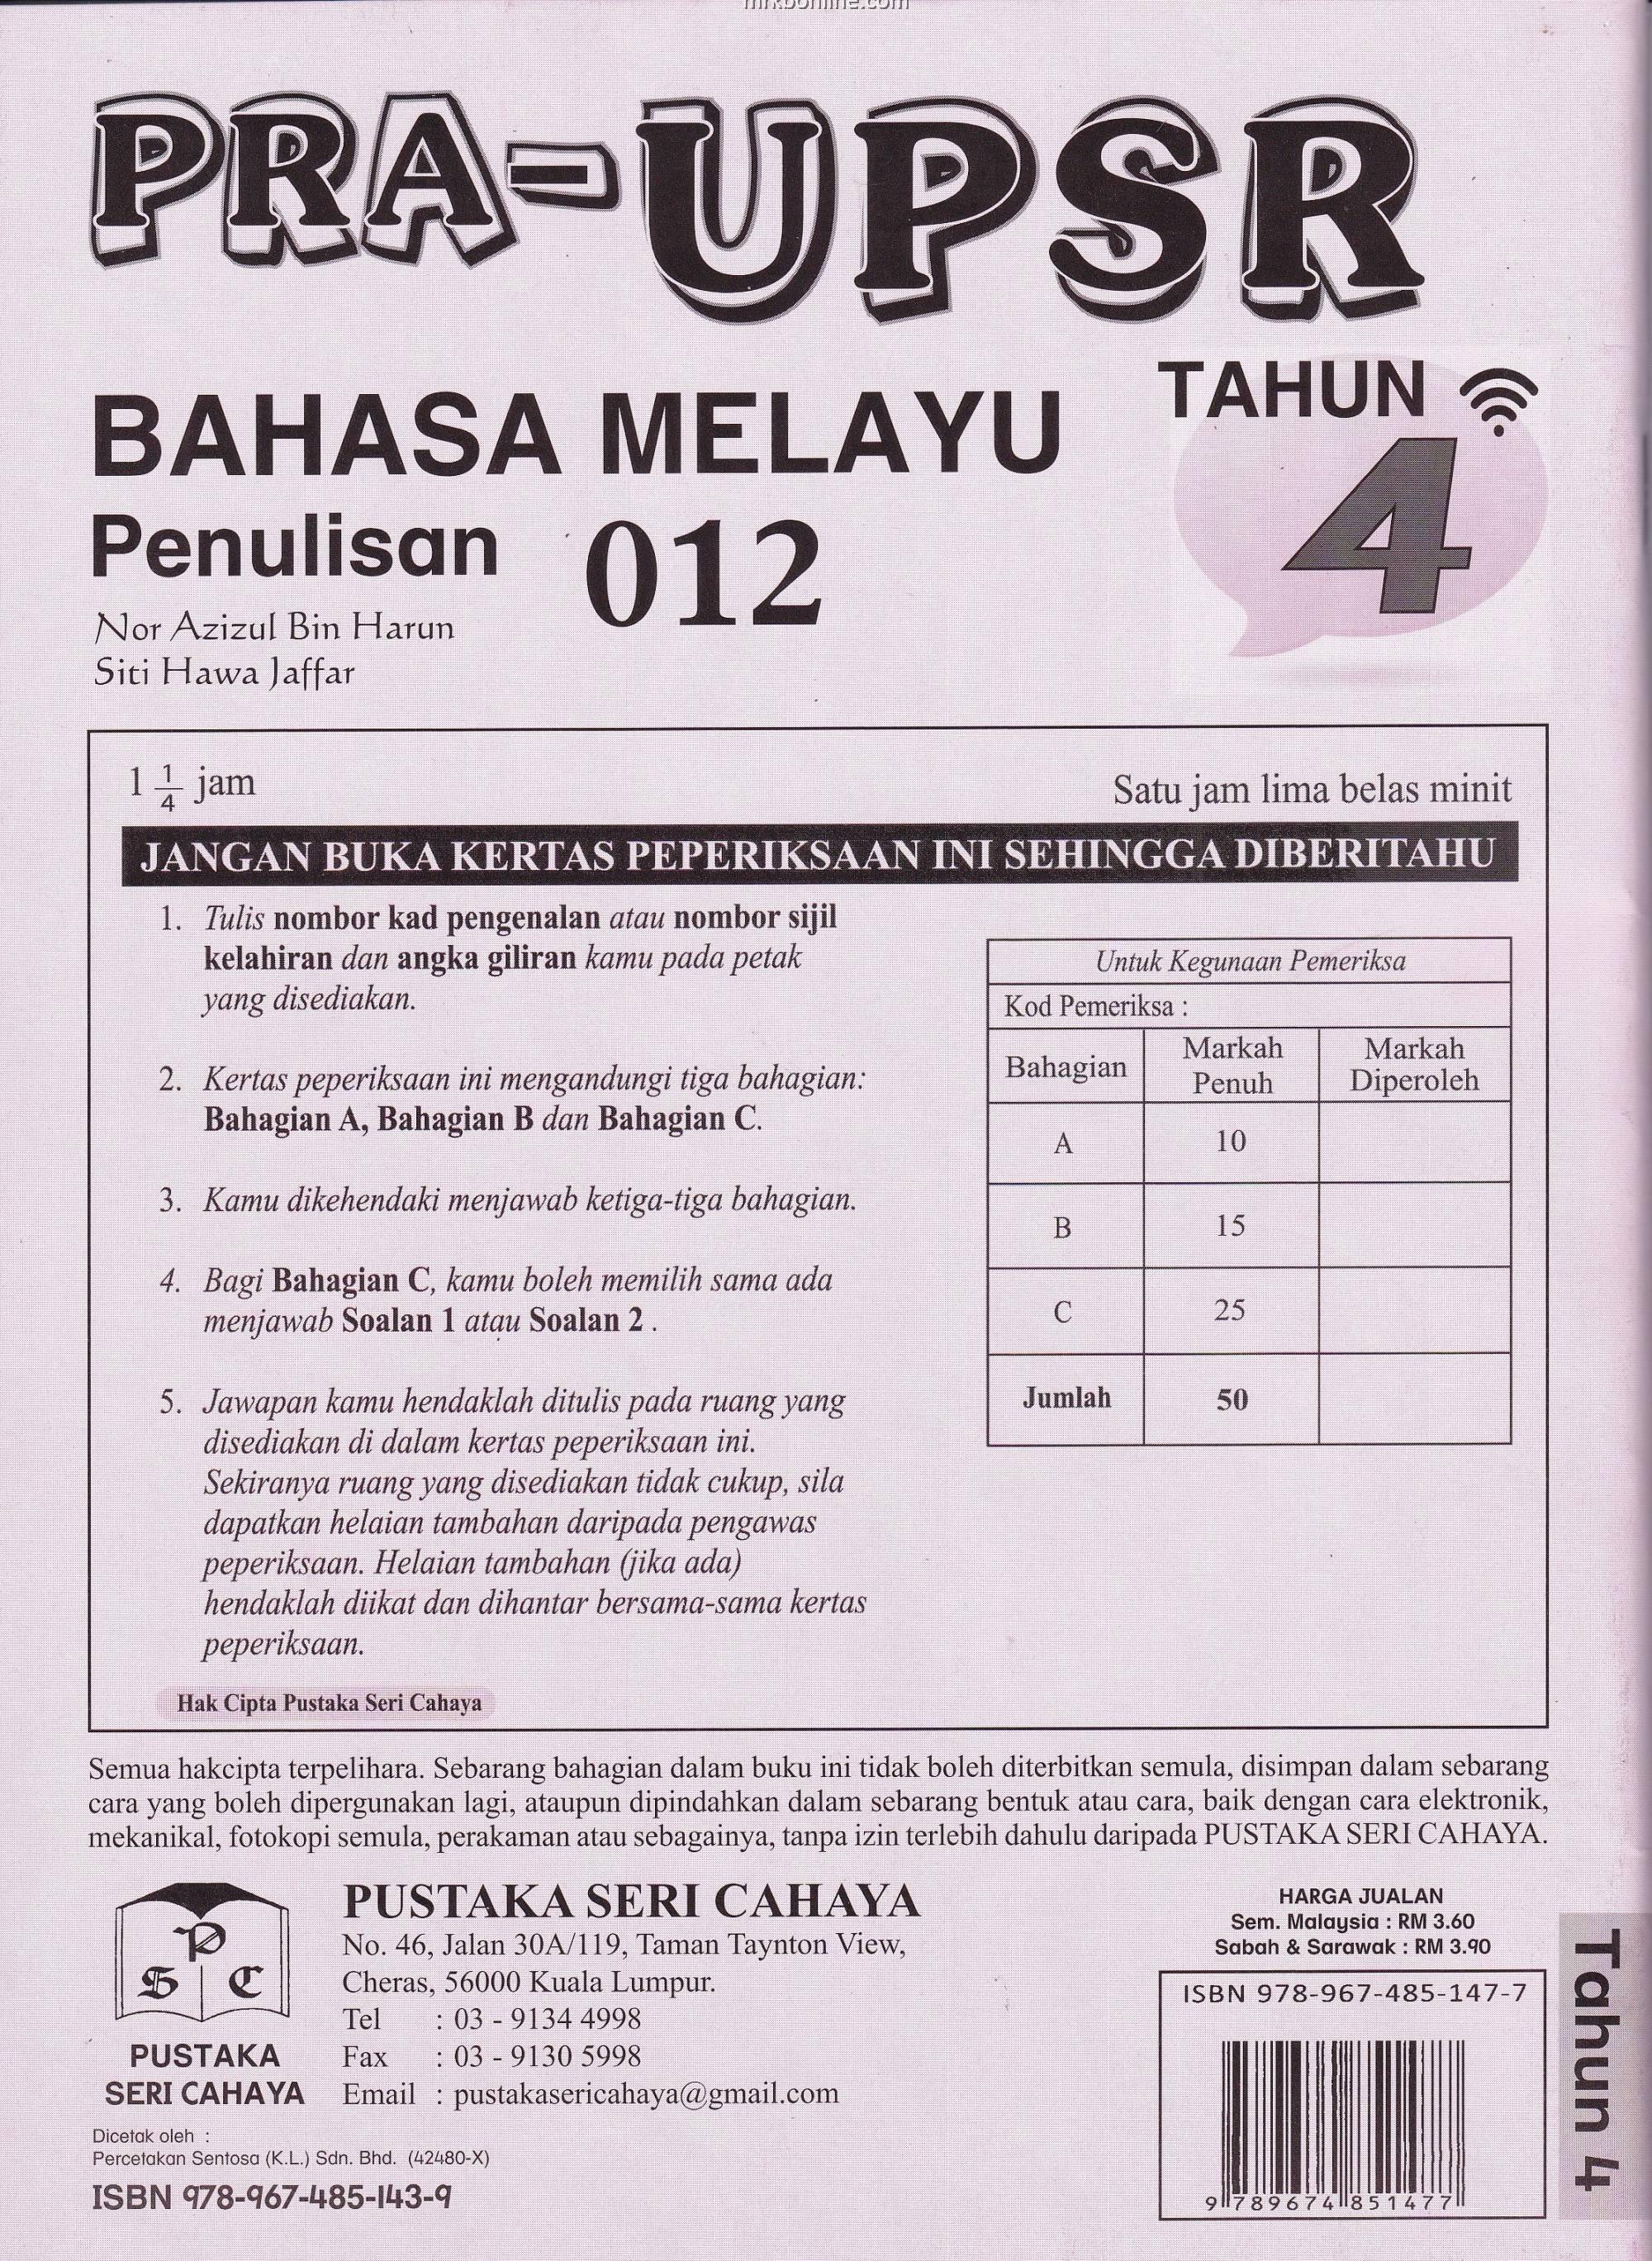 Siri Kertas Model Pra Upsr Bahasa Melayu Pemahaman 011 Penulisan 012 Tahun 4